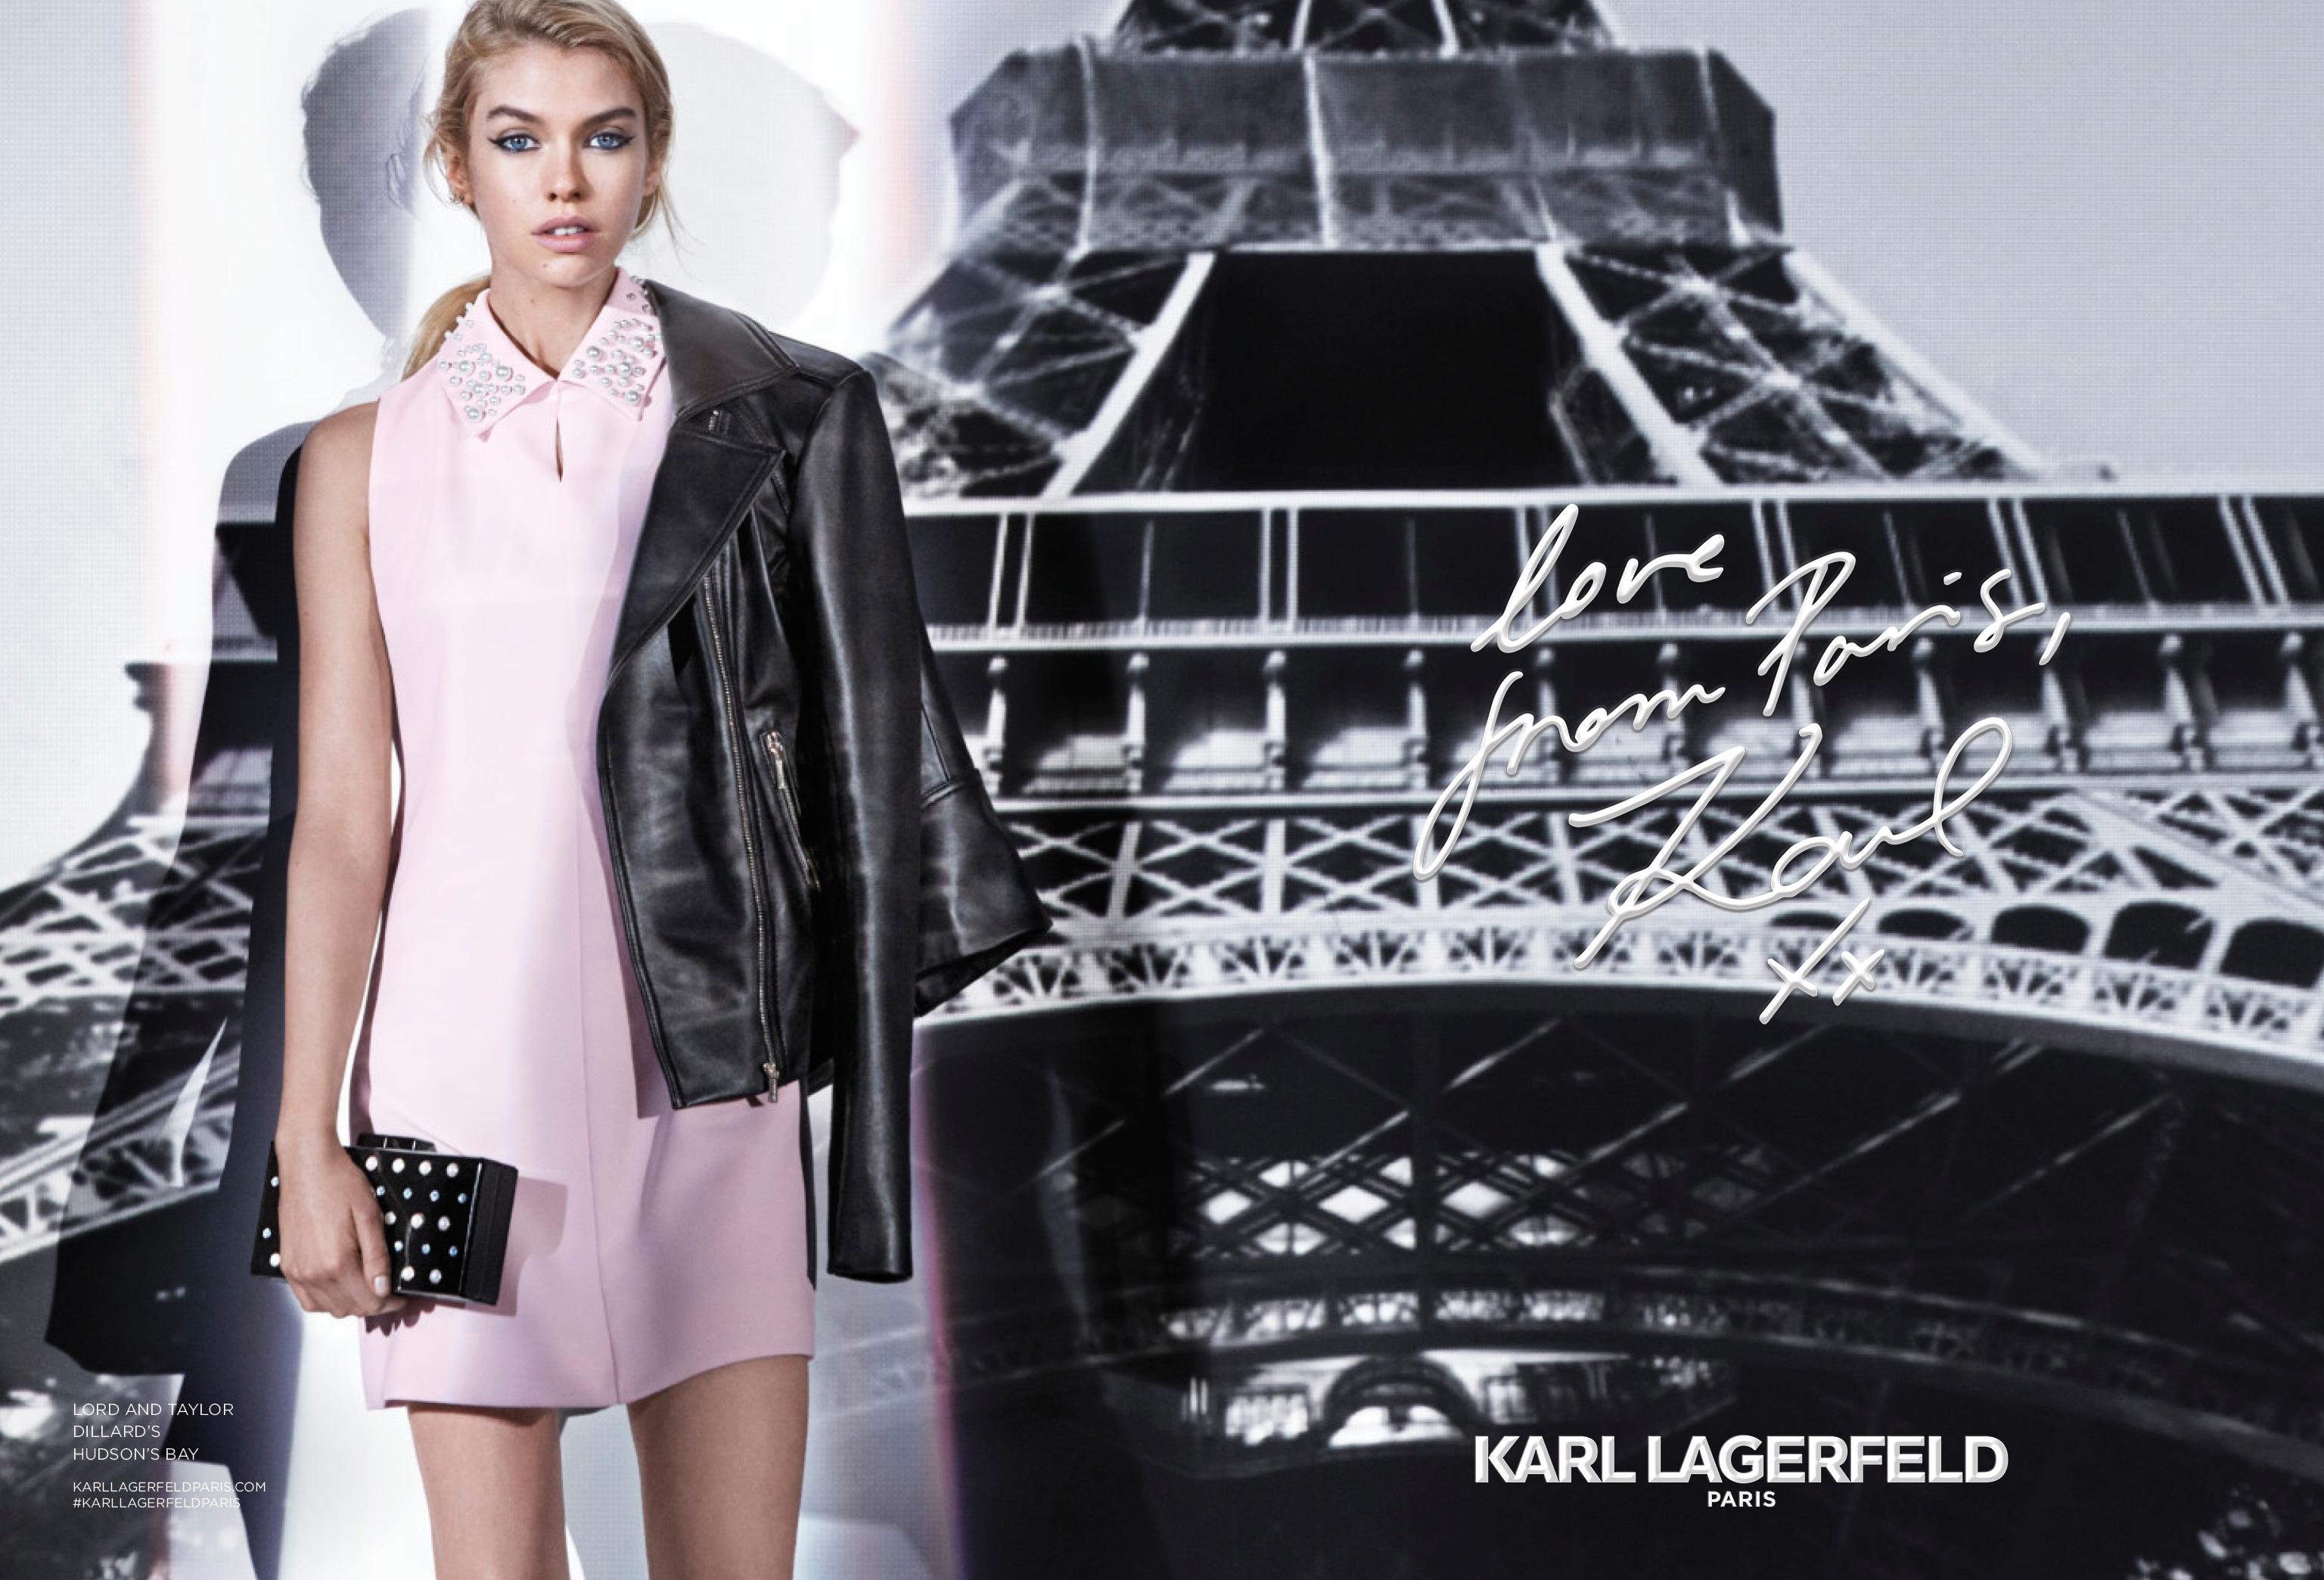 KARL LAGERFELD PARIS Fall 2017 Campaign Featuring Stella MAXWELL